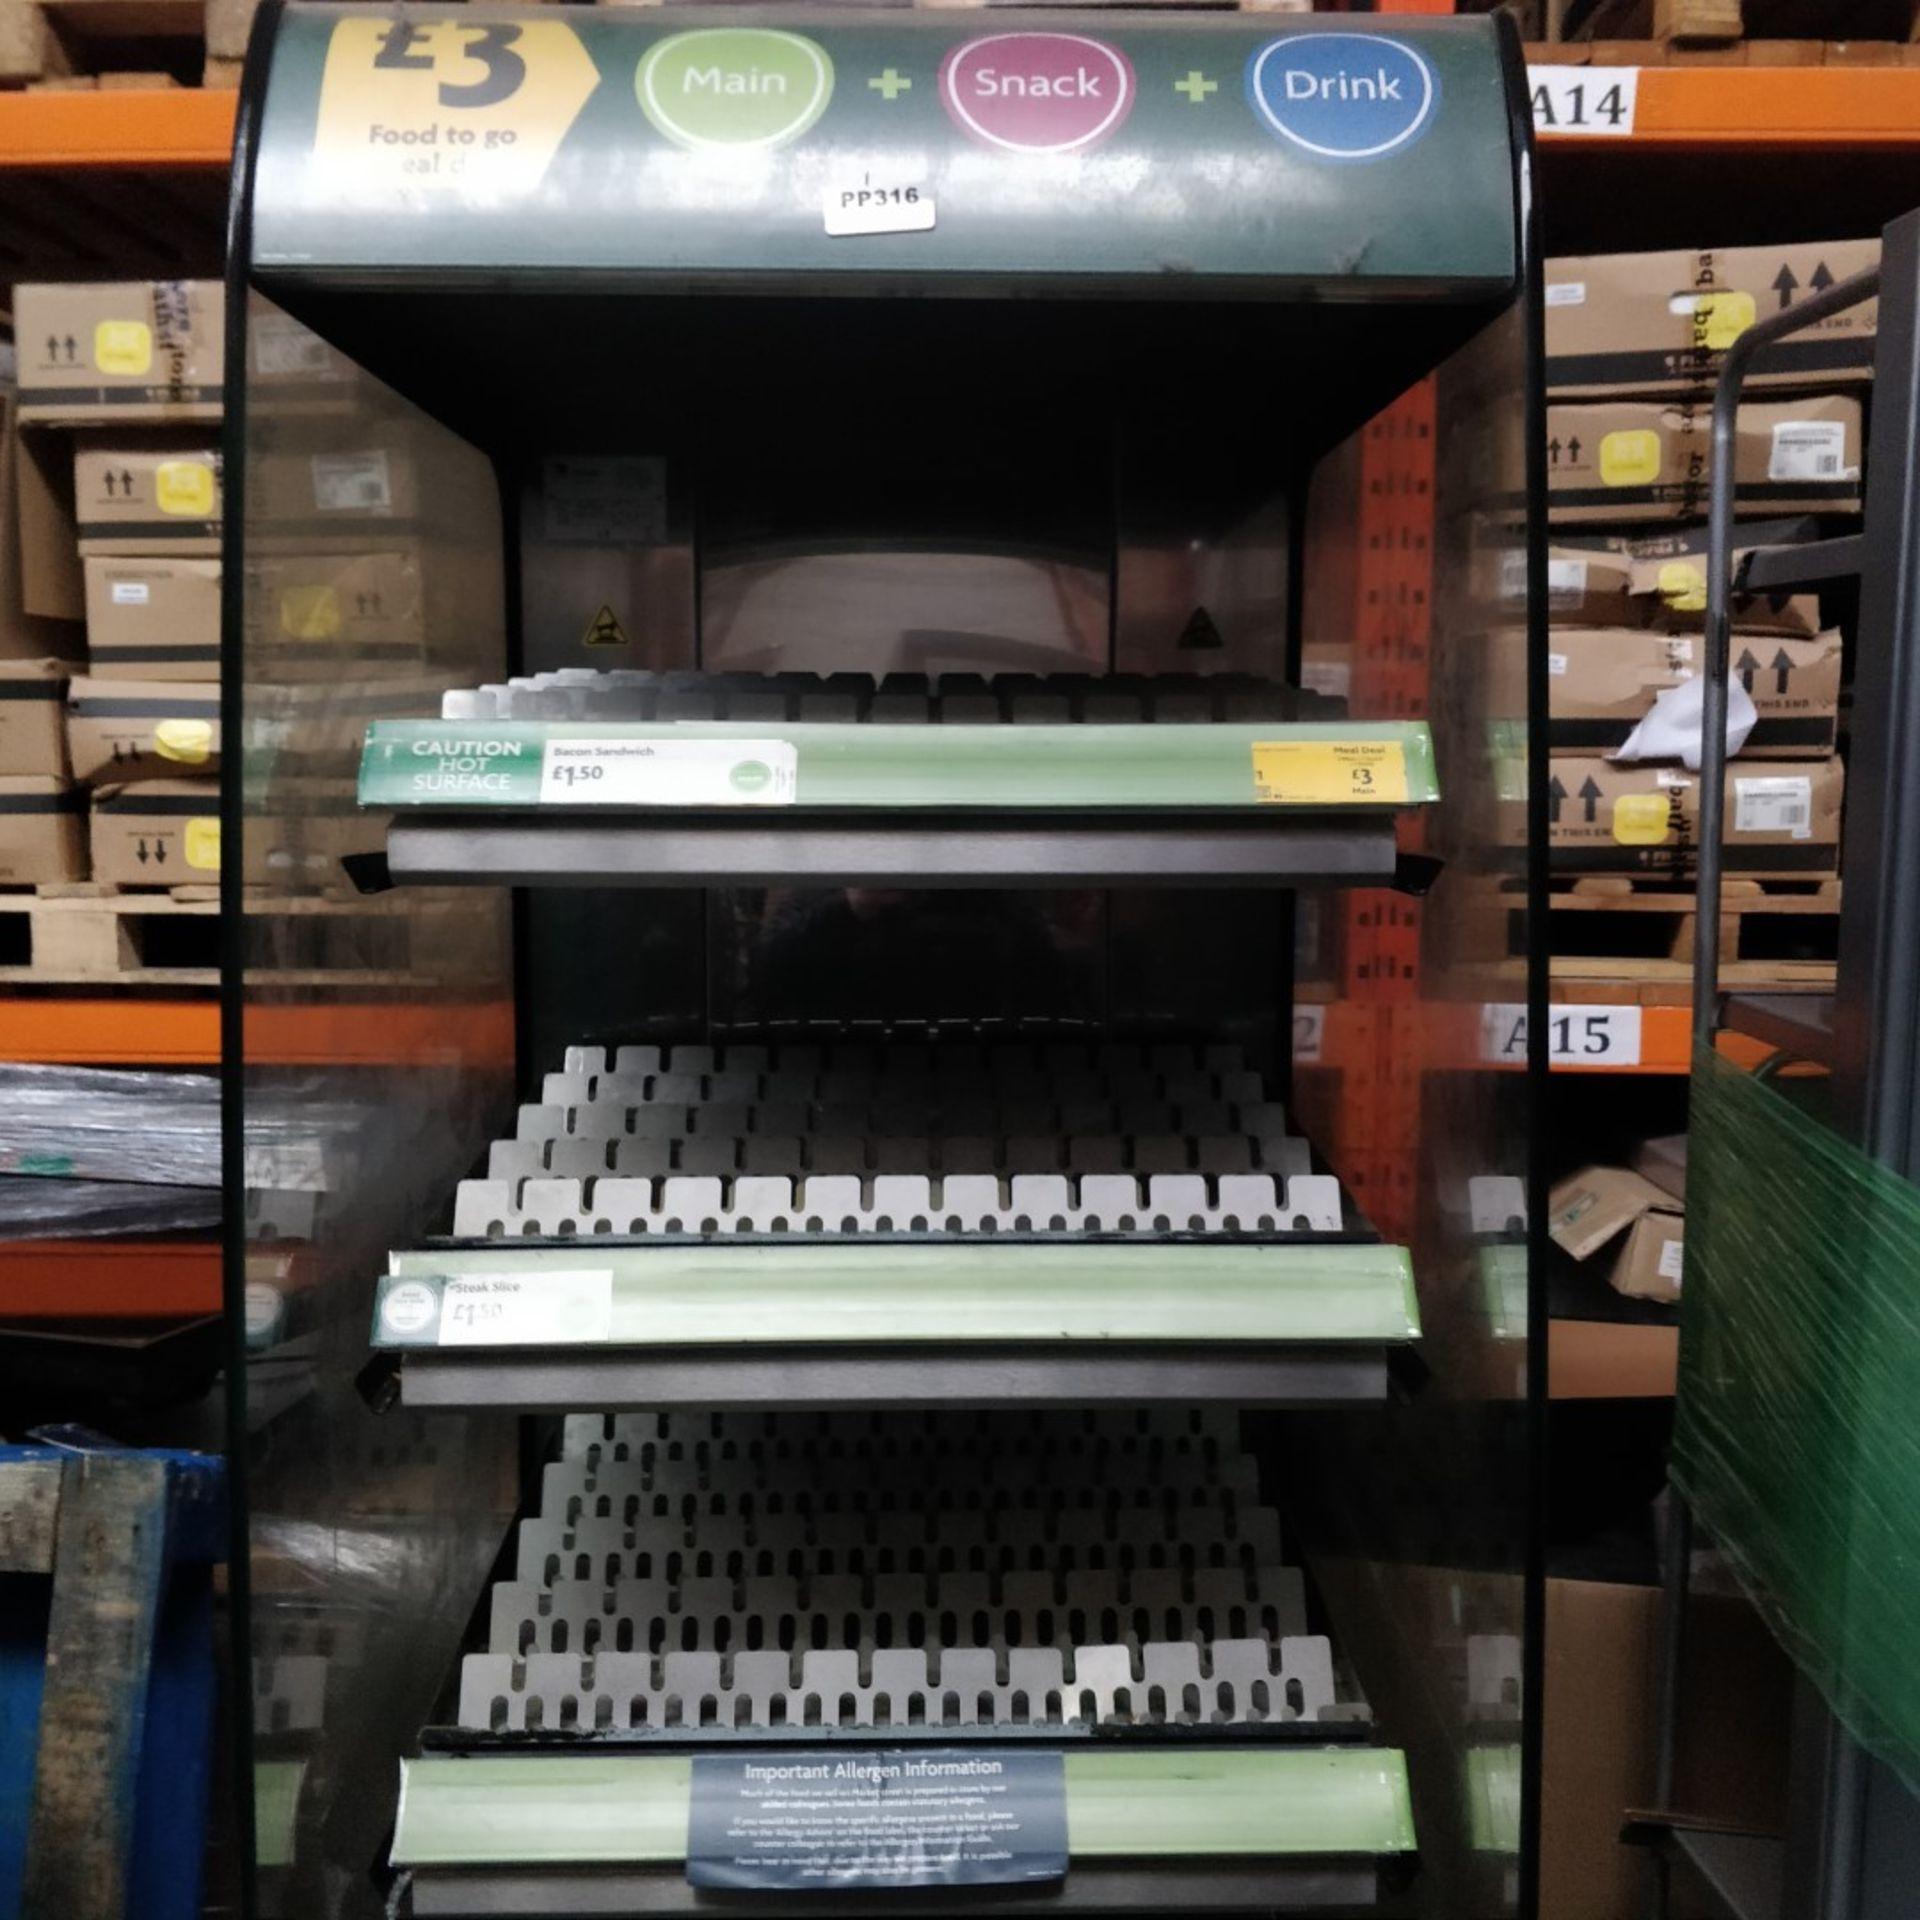 1 x Frijado Multi Deck 60 5 Level Heated Grab and Go Display Warmer - 400v 3 Phase - H197 x W60 x - Image 5 of 11